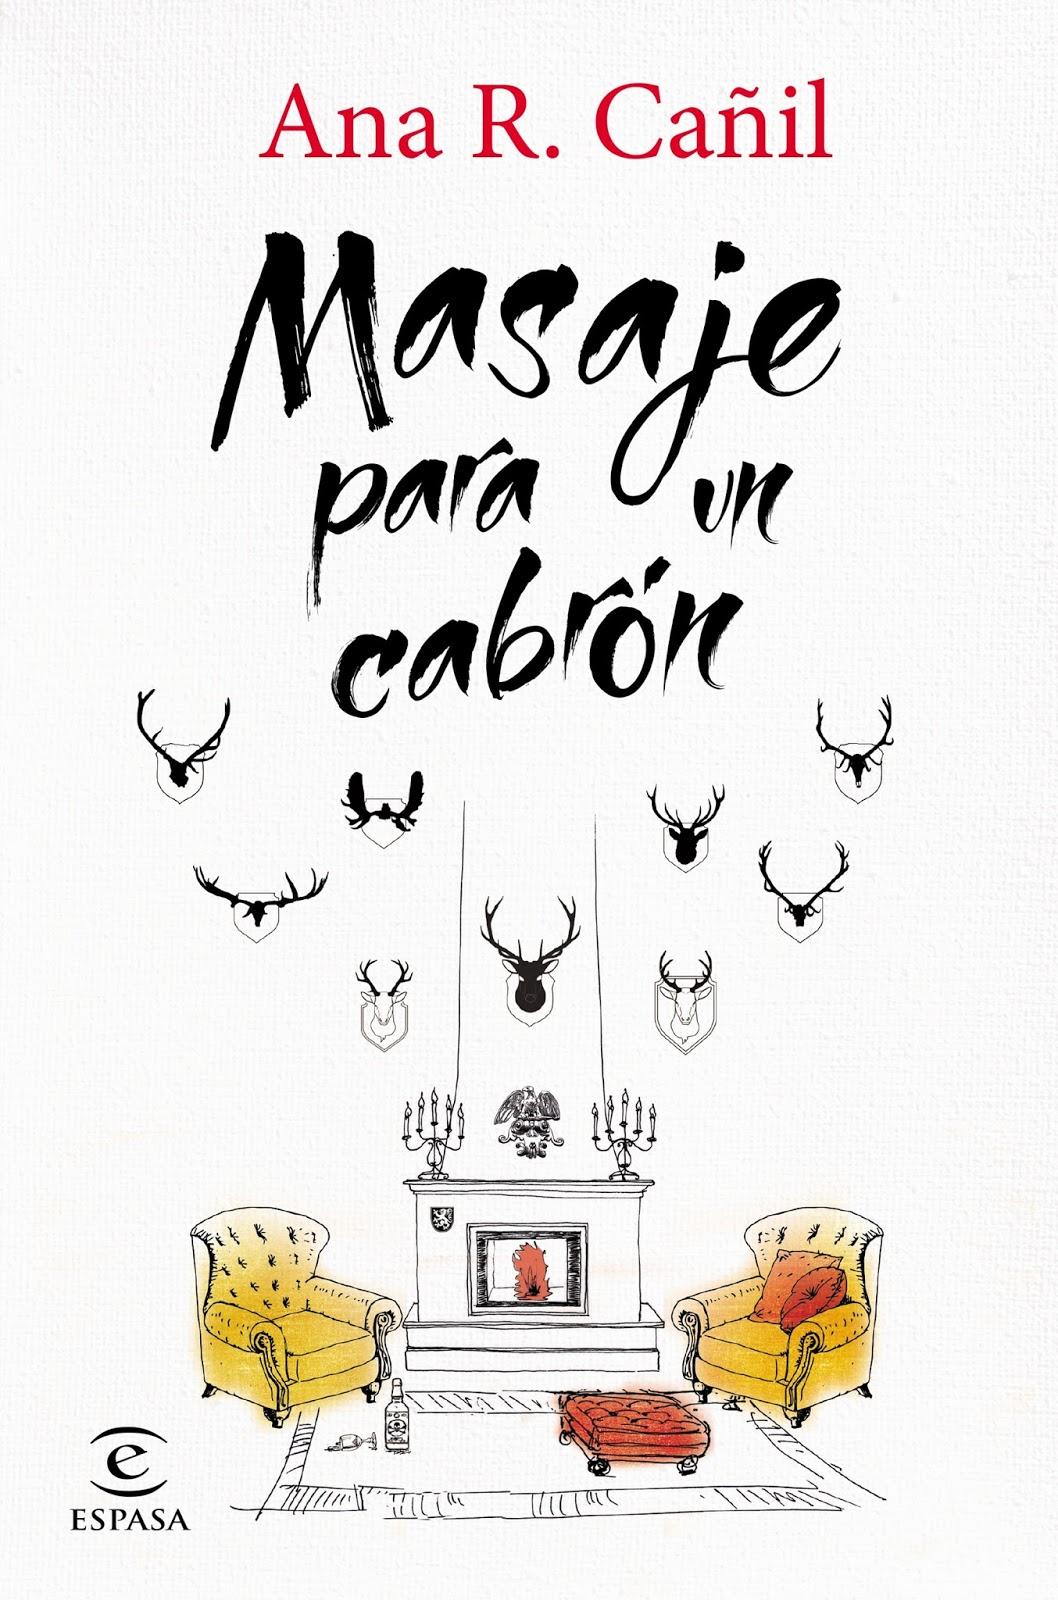 http://labibliotecadebella.blogspot.com.es/2016/02/masaje-para-un-cabron-ana-r-canil.html